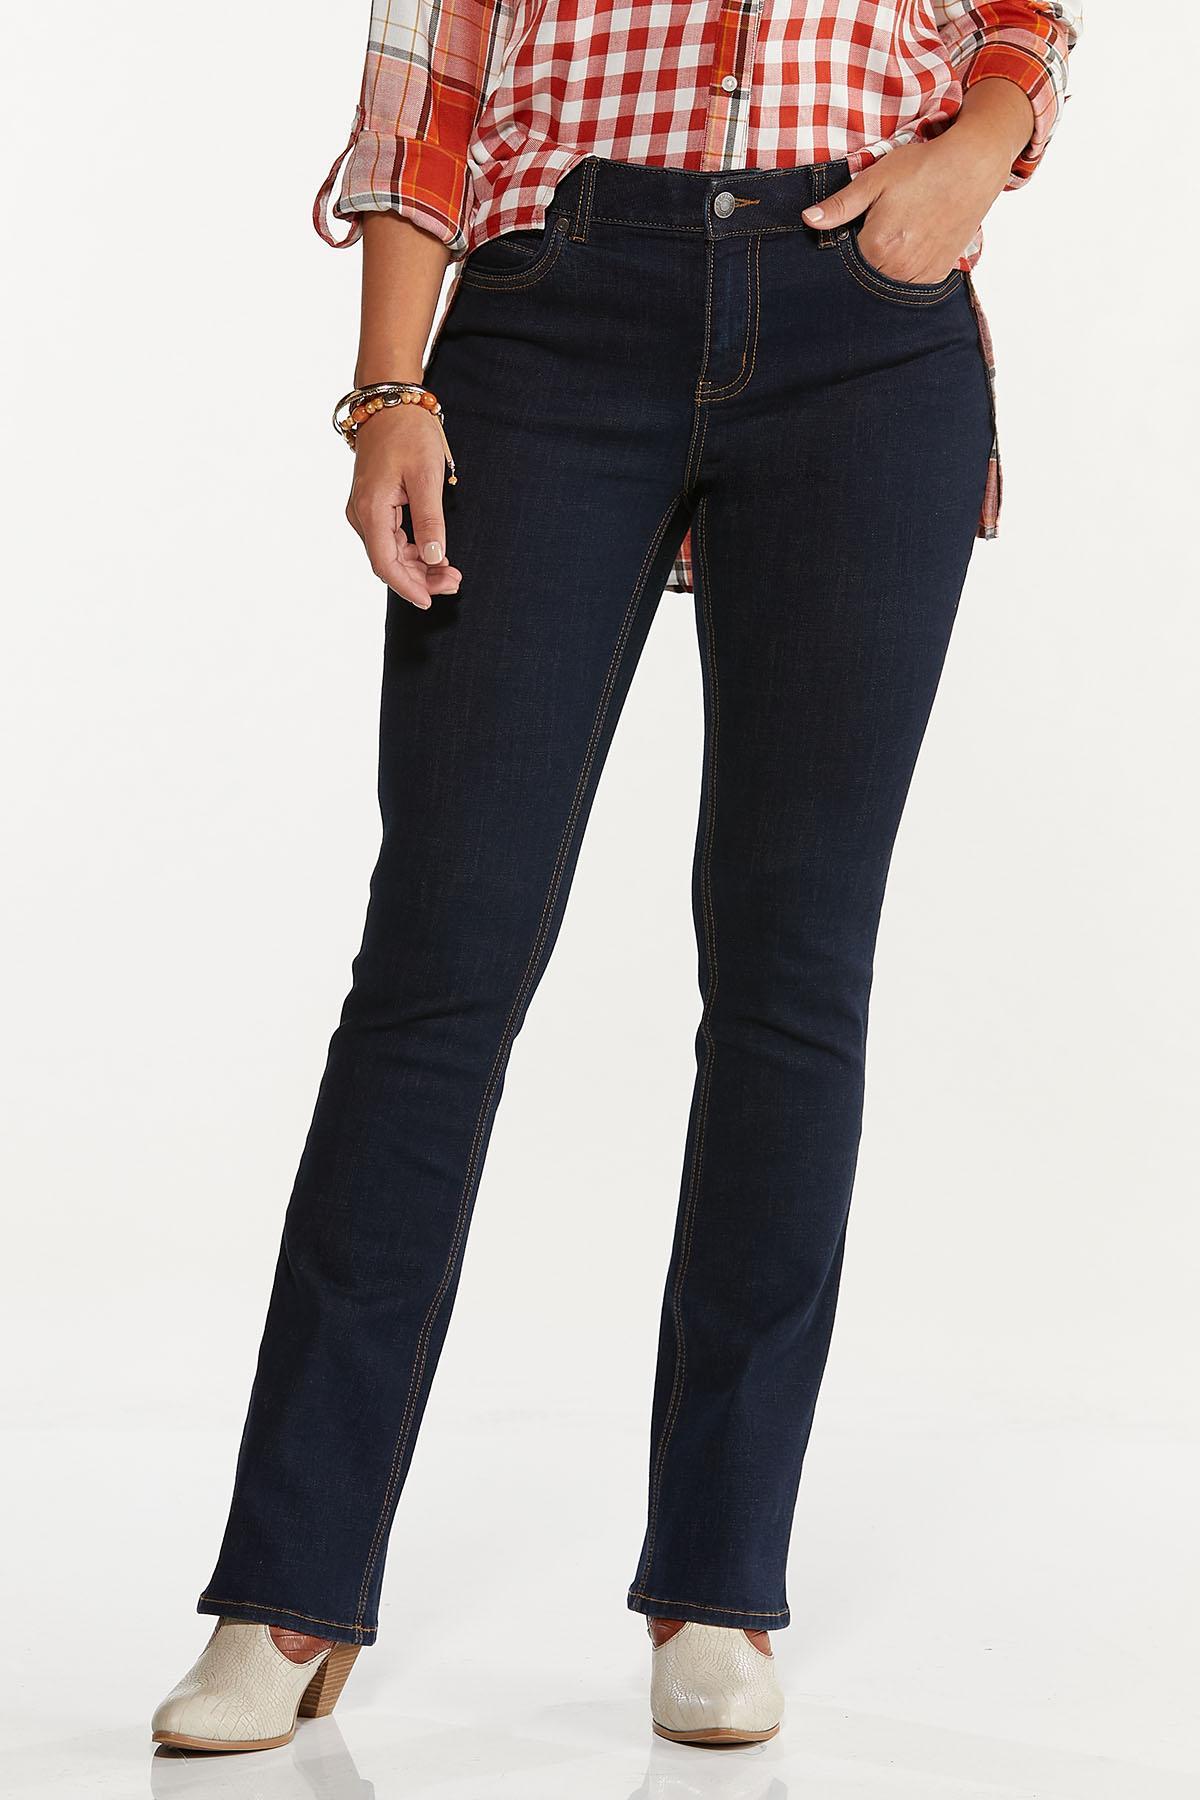 Petite Dark Bootcut Jeans (Item #44662396)